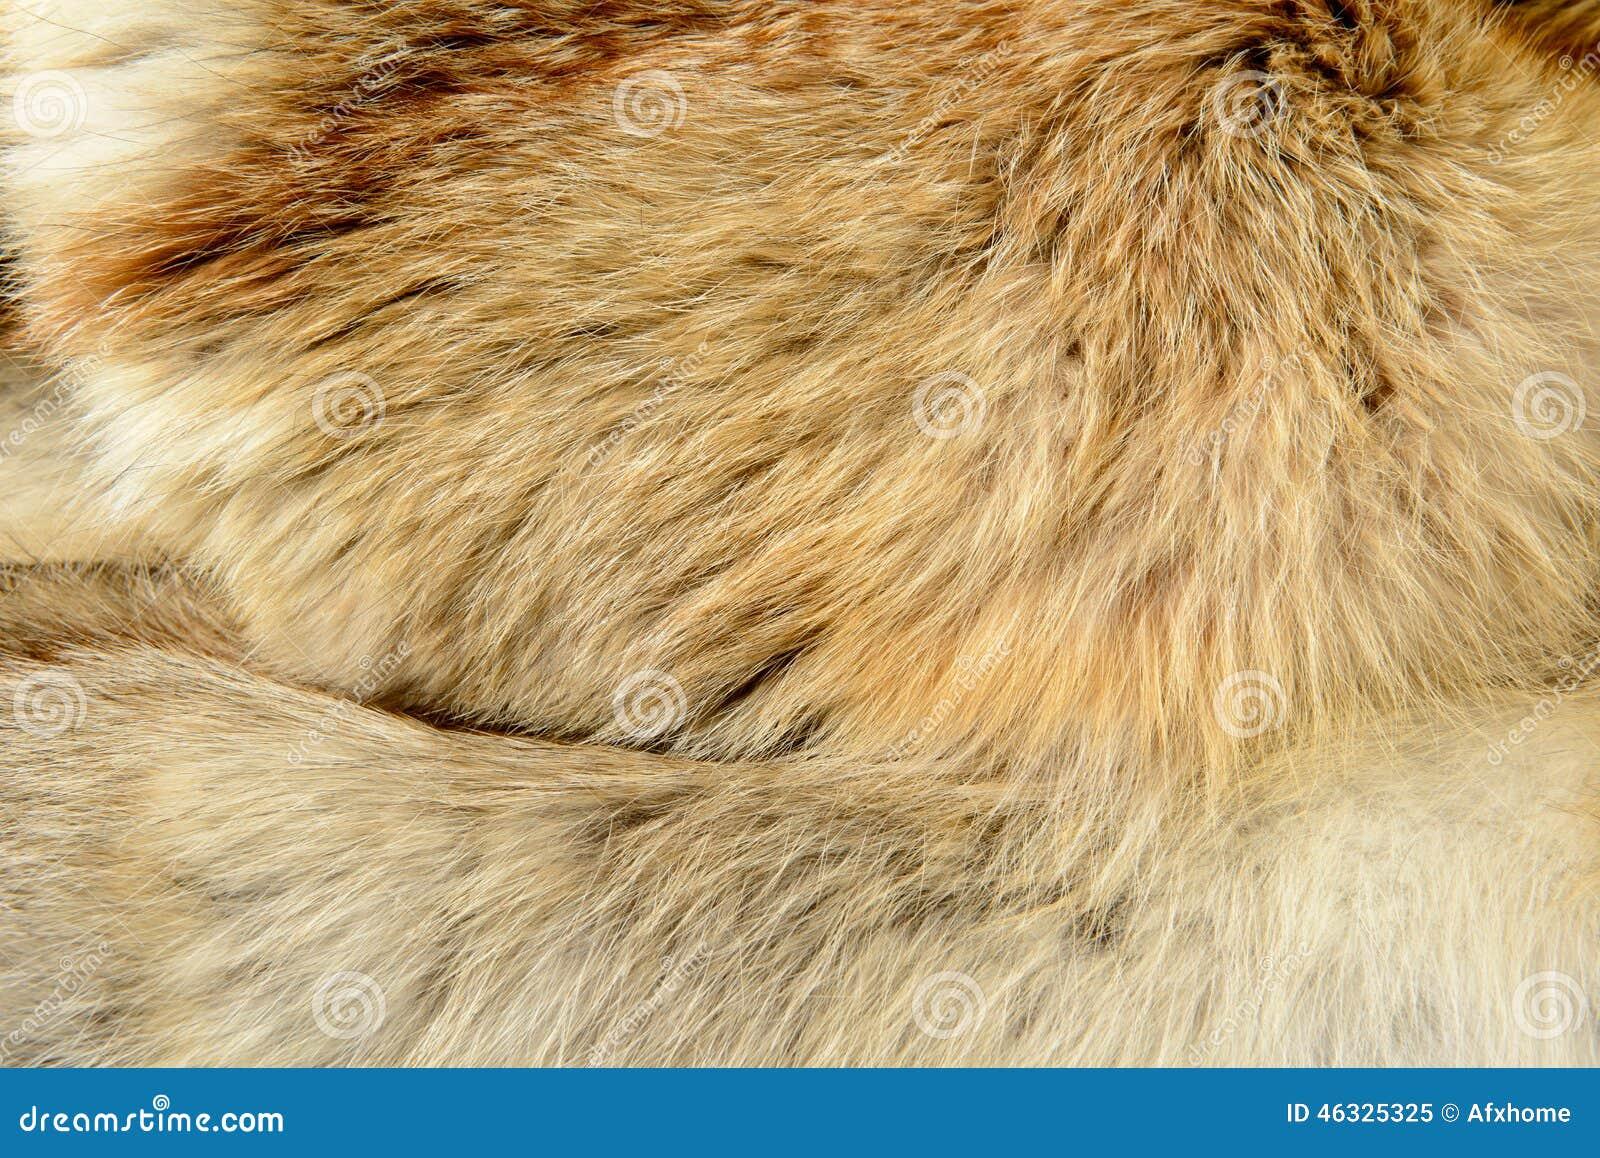 texture fur animal background - photo #15